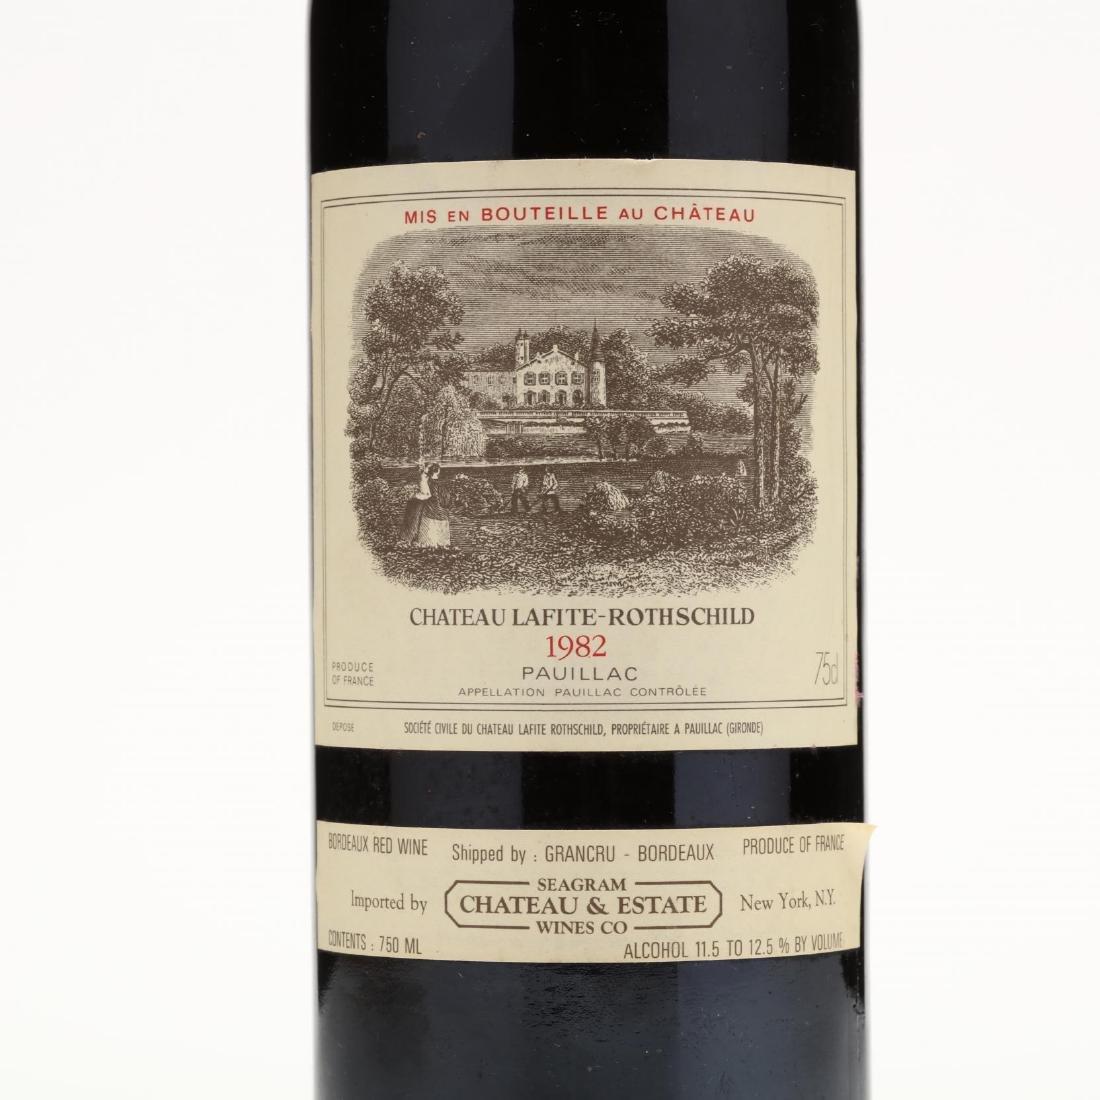 Chateau Lafite-Rothschild - Vintage 1982 - 2